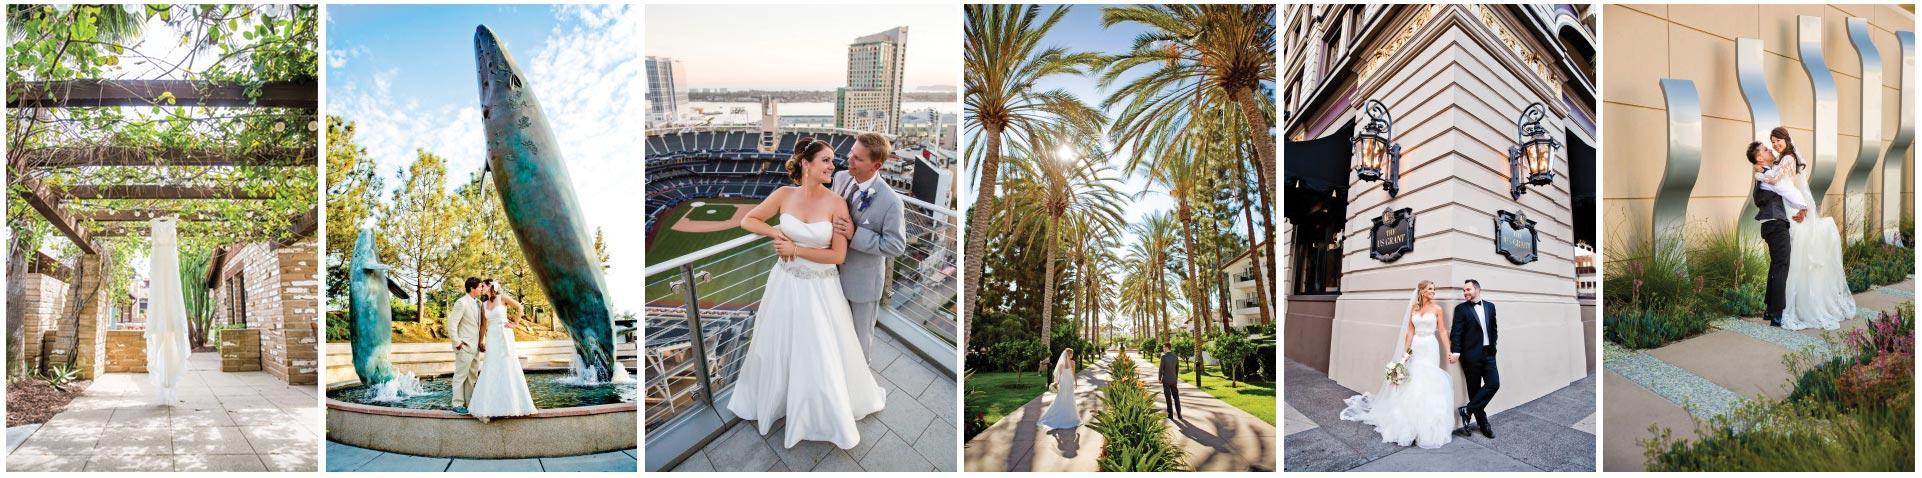 san diego wedding venue guide